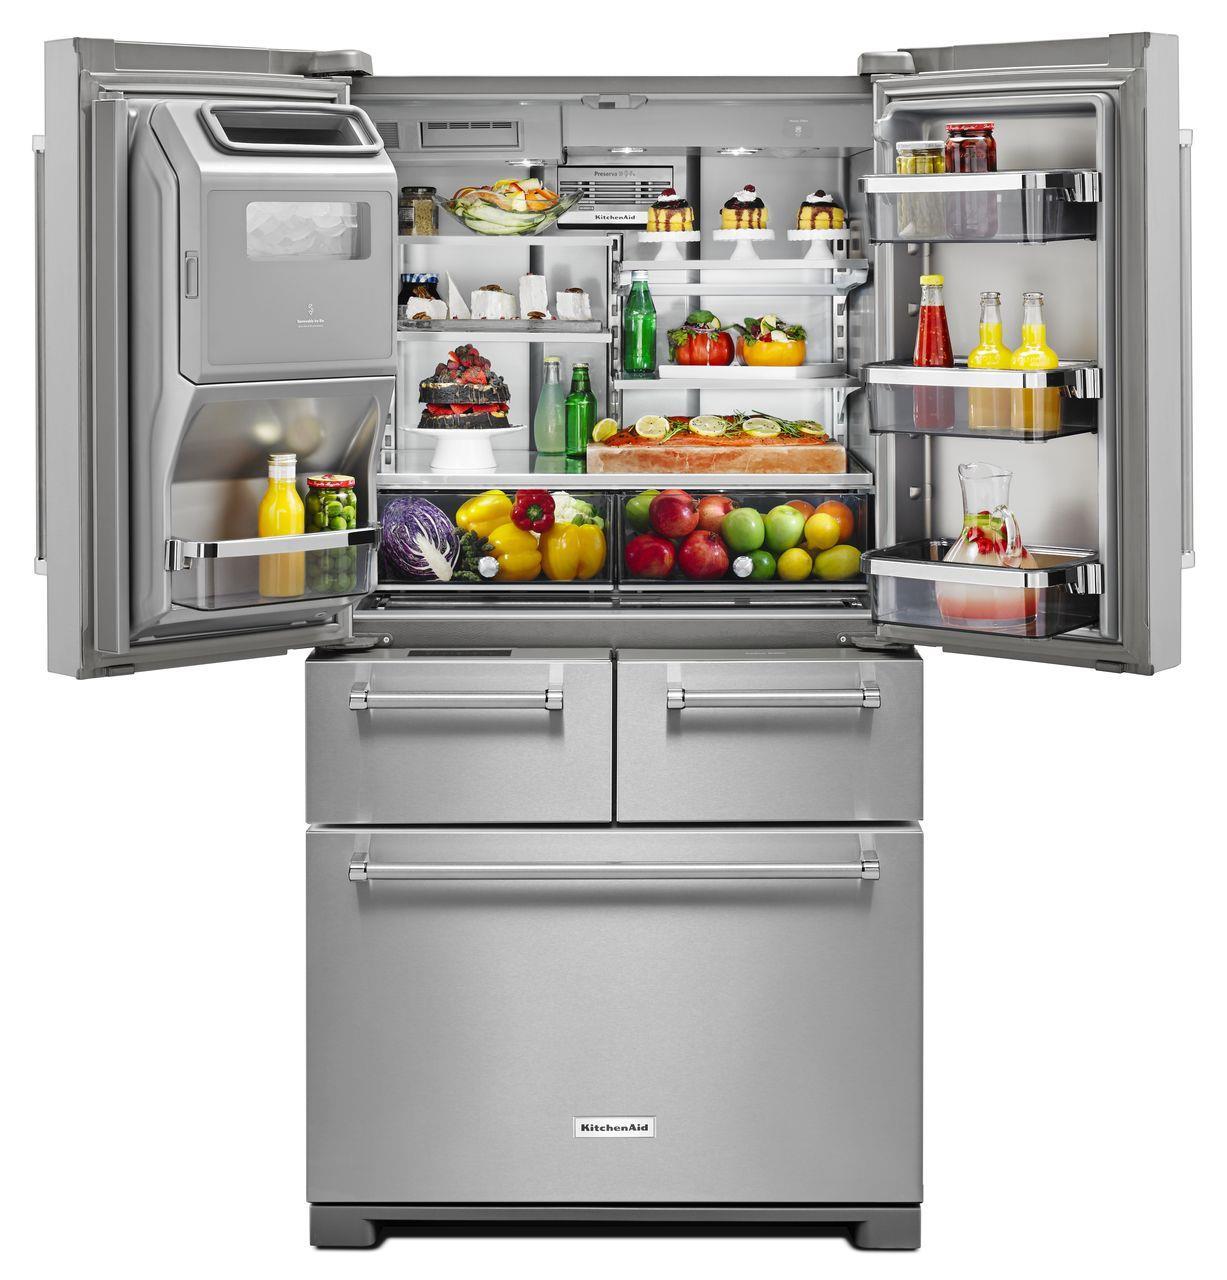 Kitchenaid krmf706ess25 8 cu ft 36 multi door freestanding refrigerator with platinum for Platinum interior refrigerator